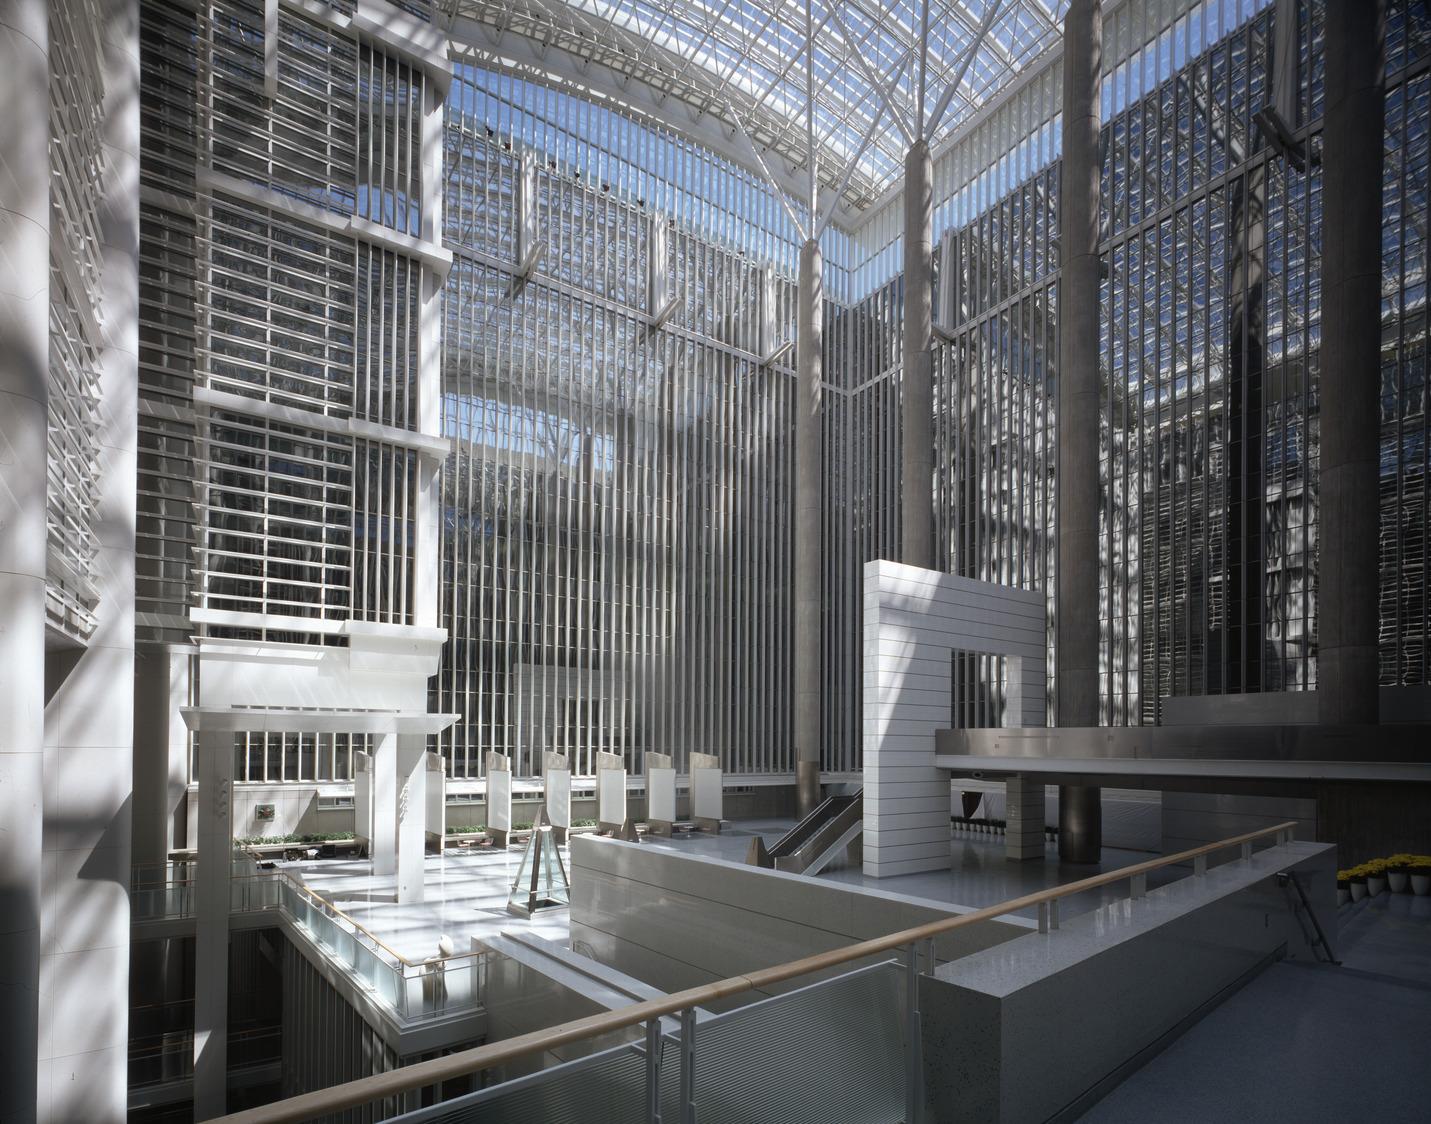 The World Bank Atrium, Washington, D.C.